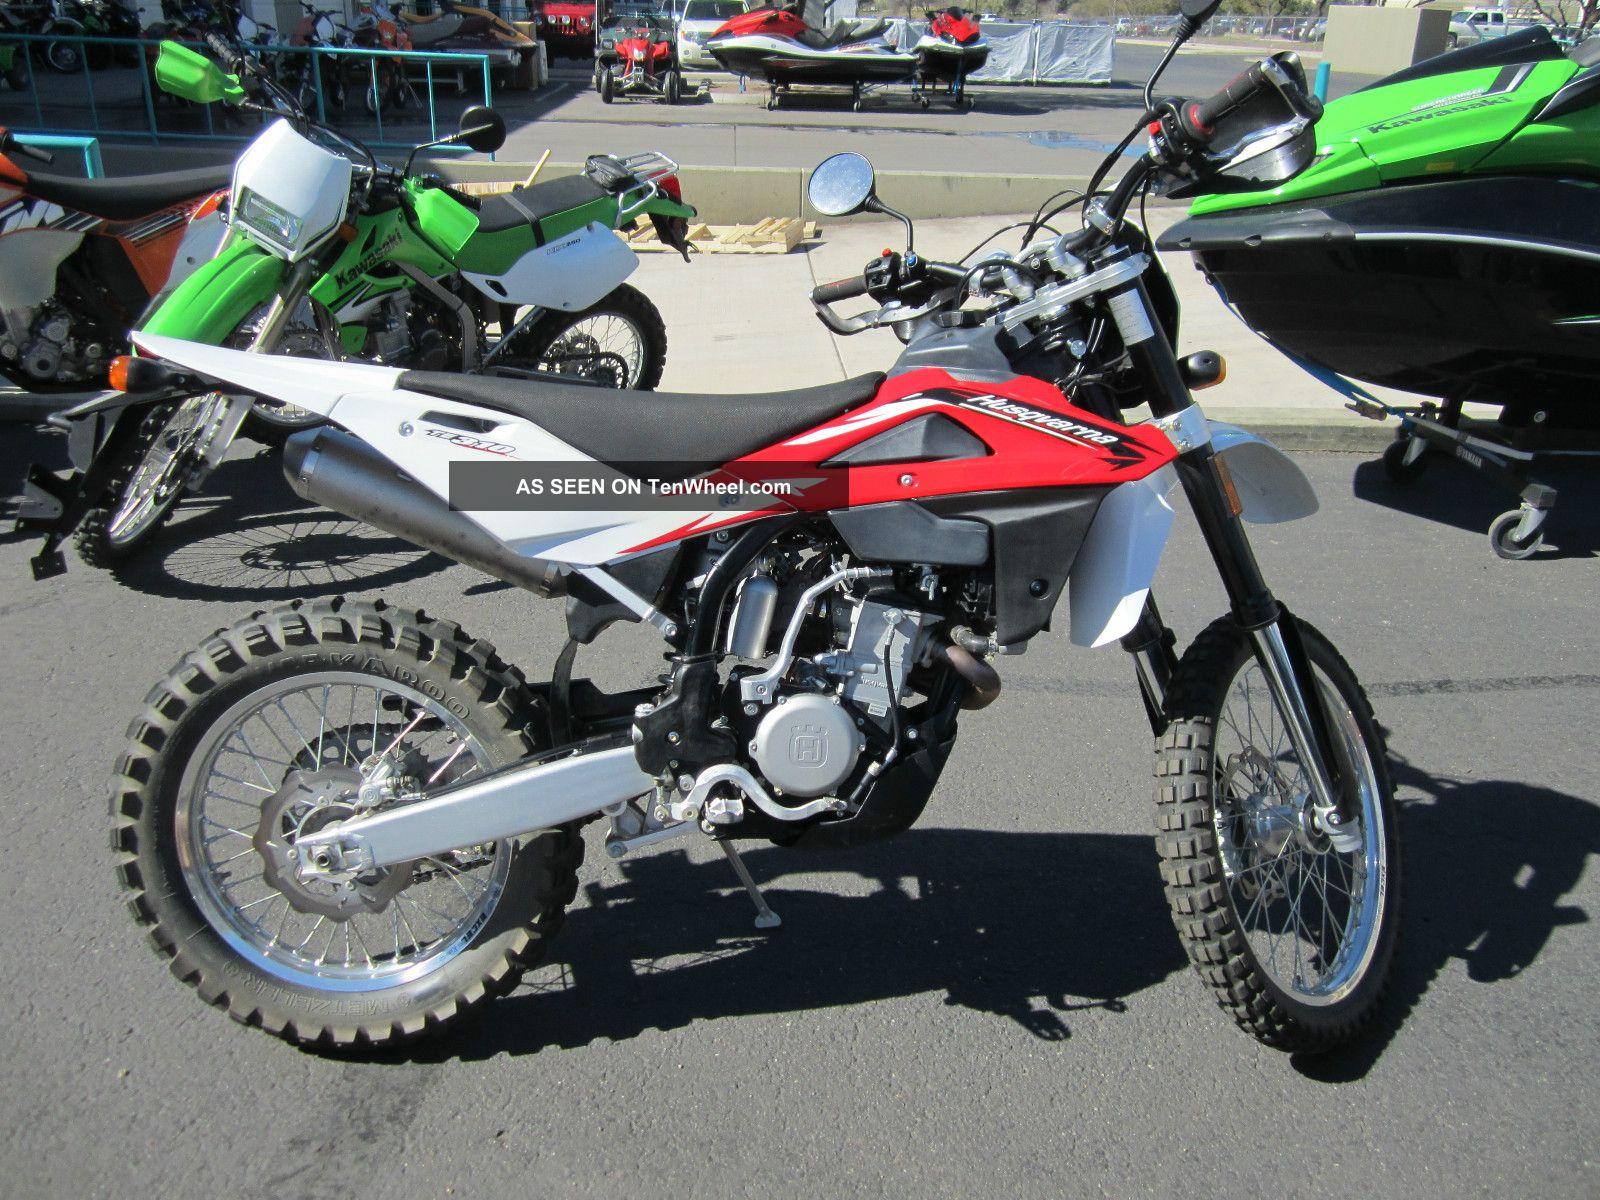 2012 Husqvarna Te 310 Dualsport Motorcycle Demo Model $8199 Now $4999 Nr Husqvarna photo